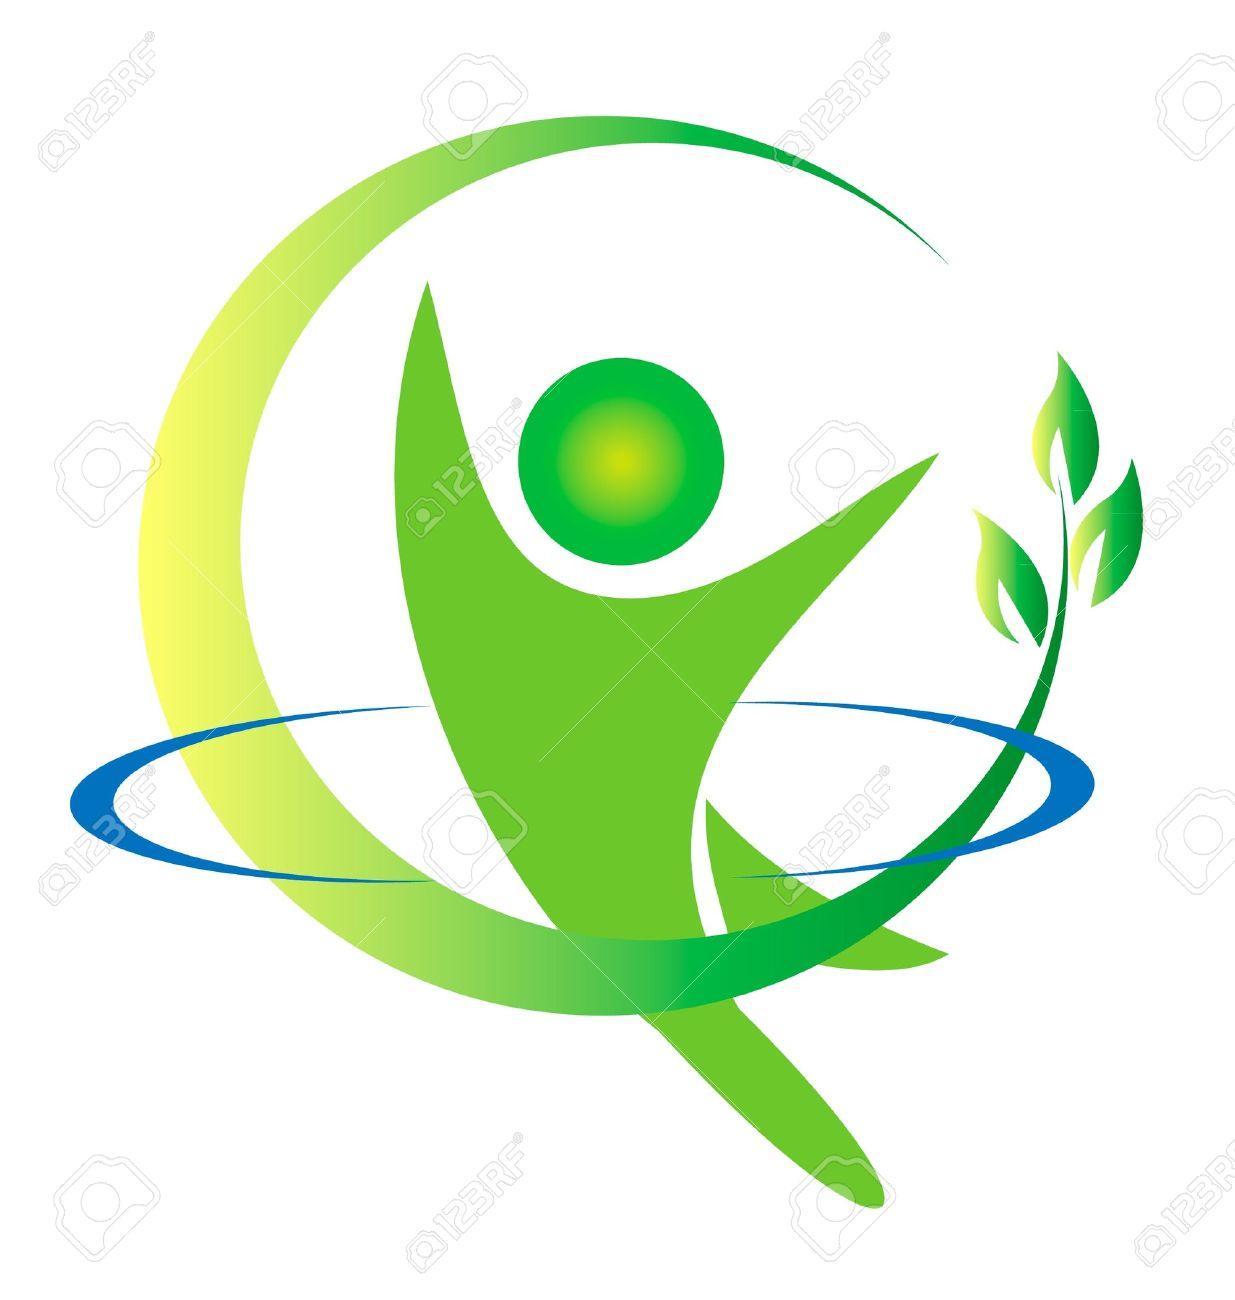 Health nature logo - 13643141